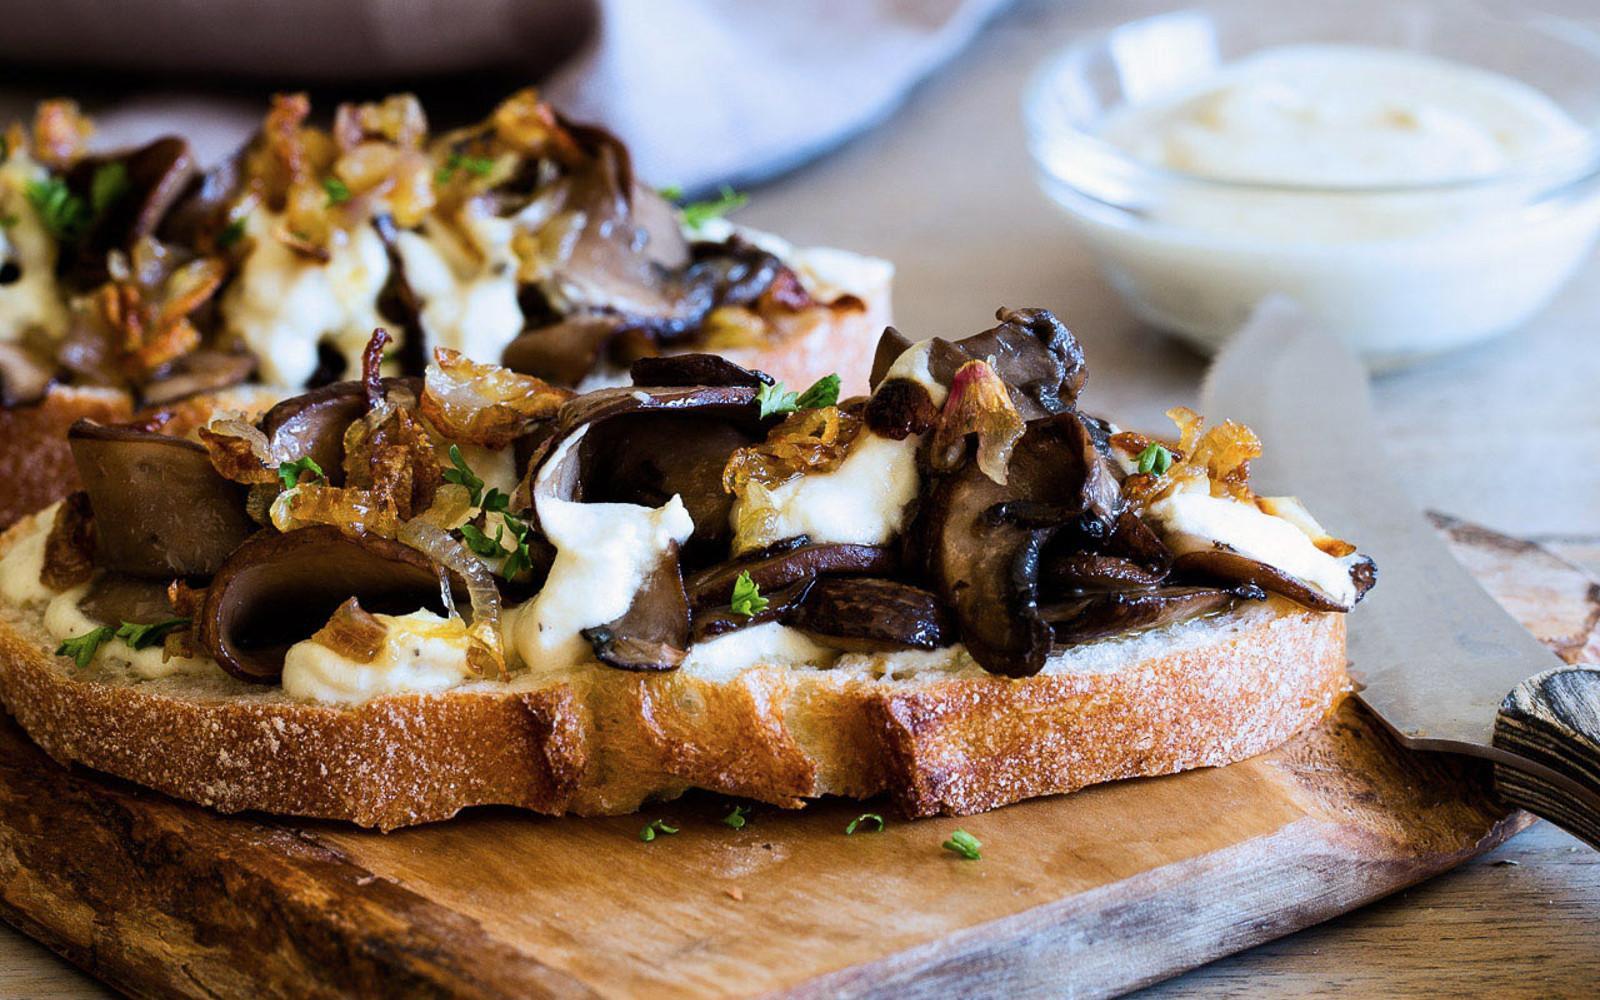 caramelized shallot and portobello open-faced sandwich